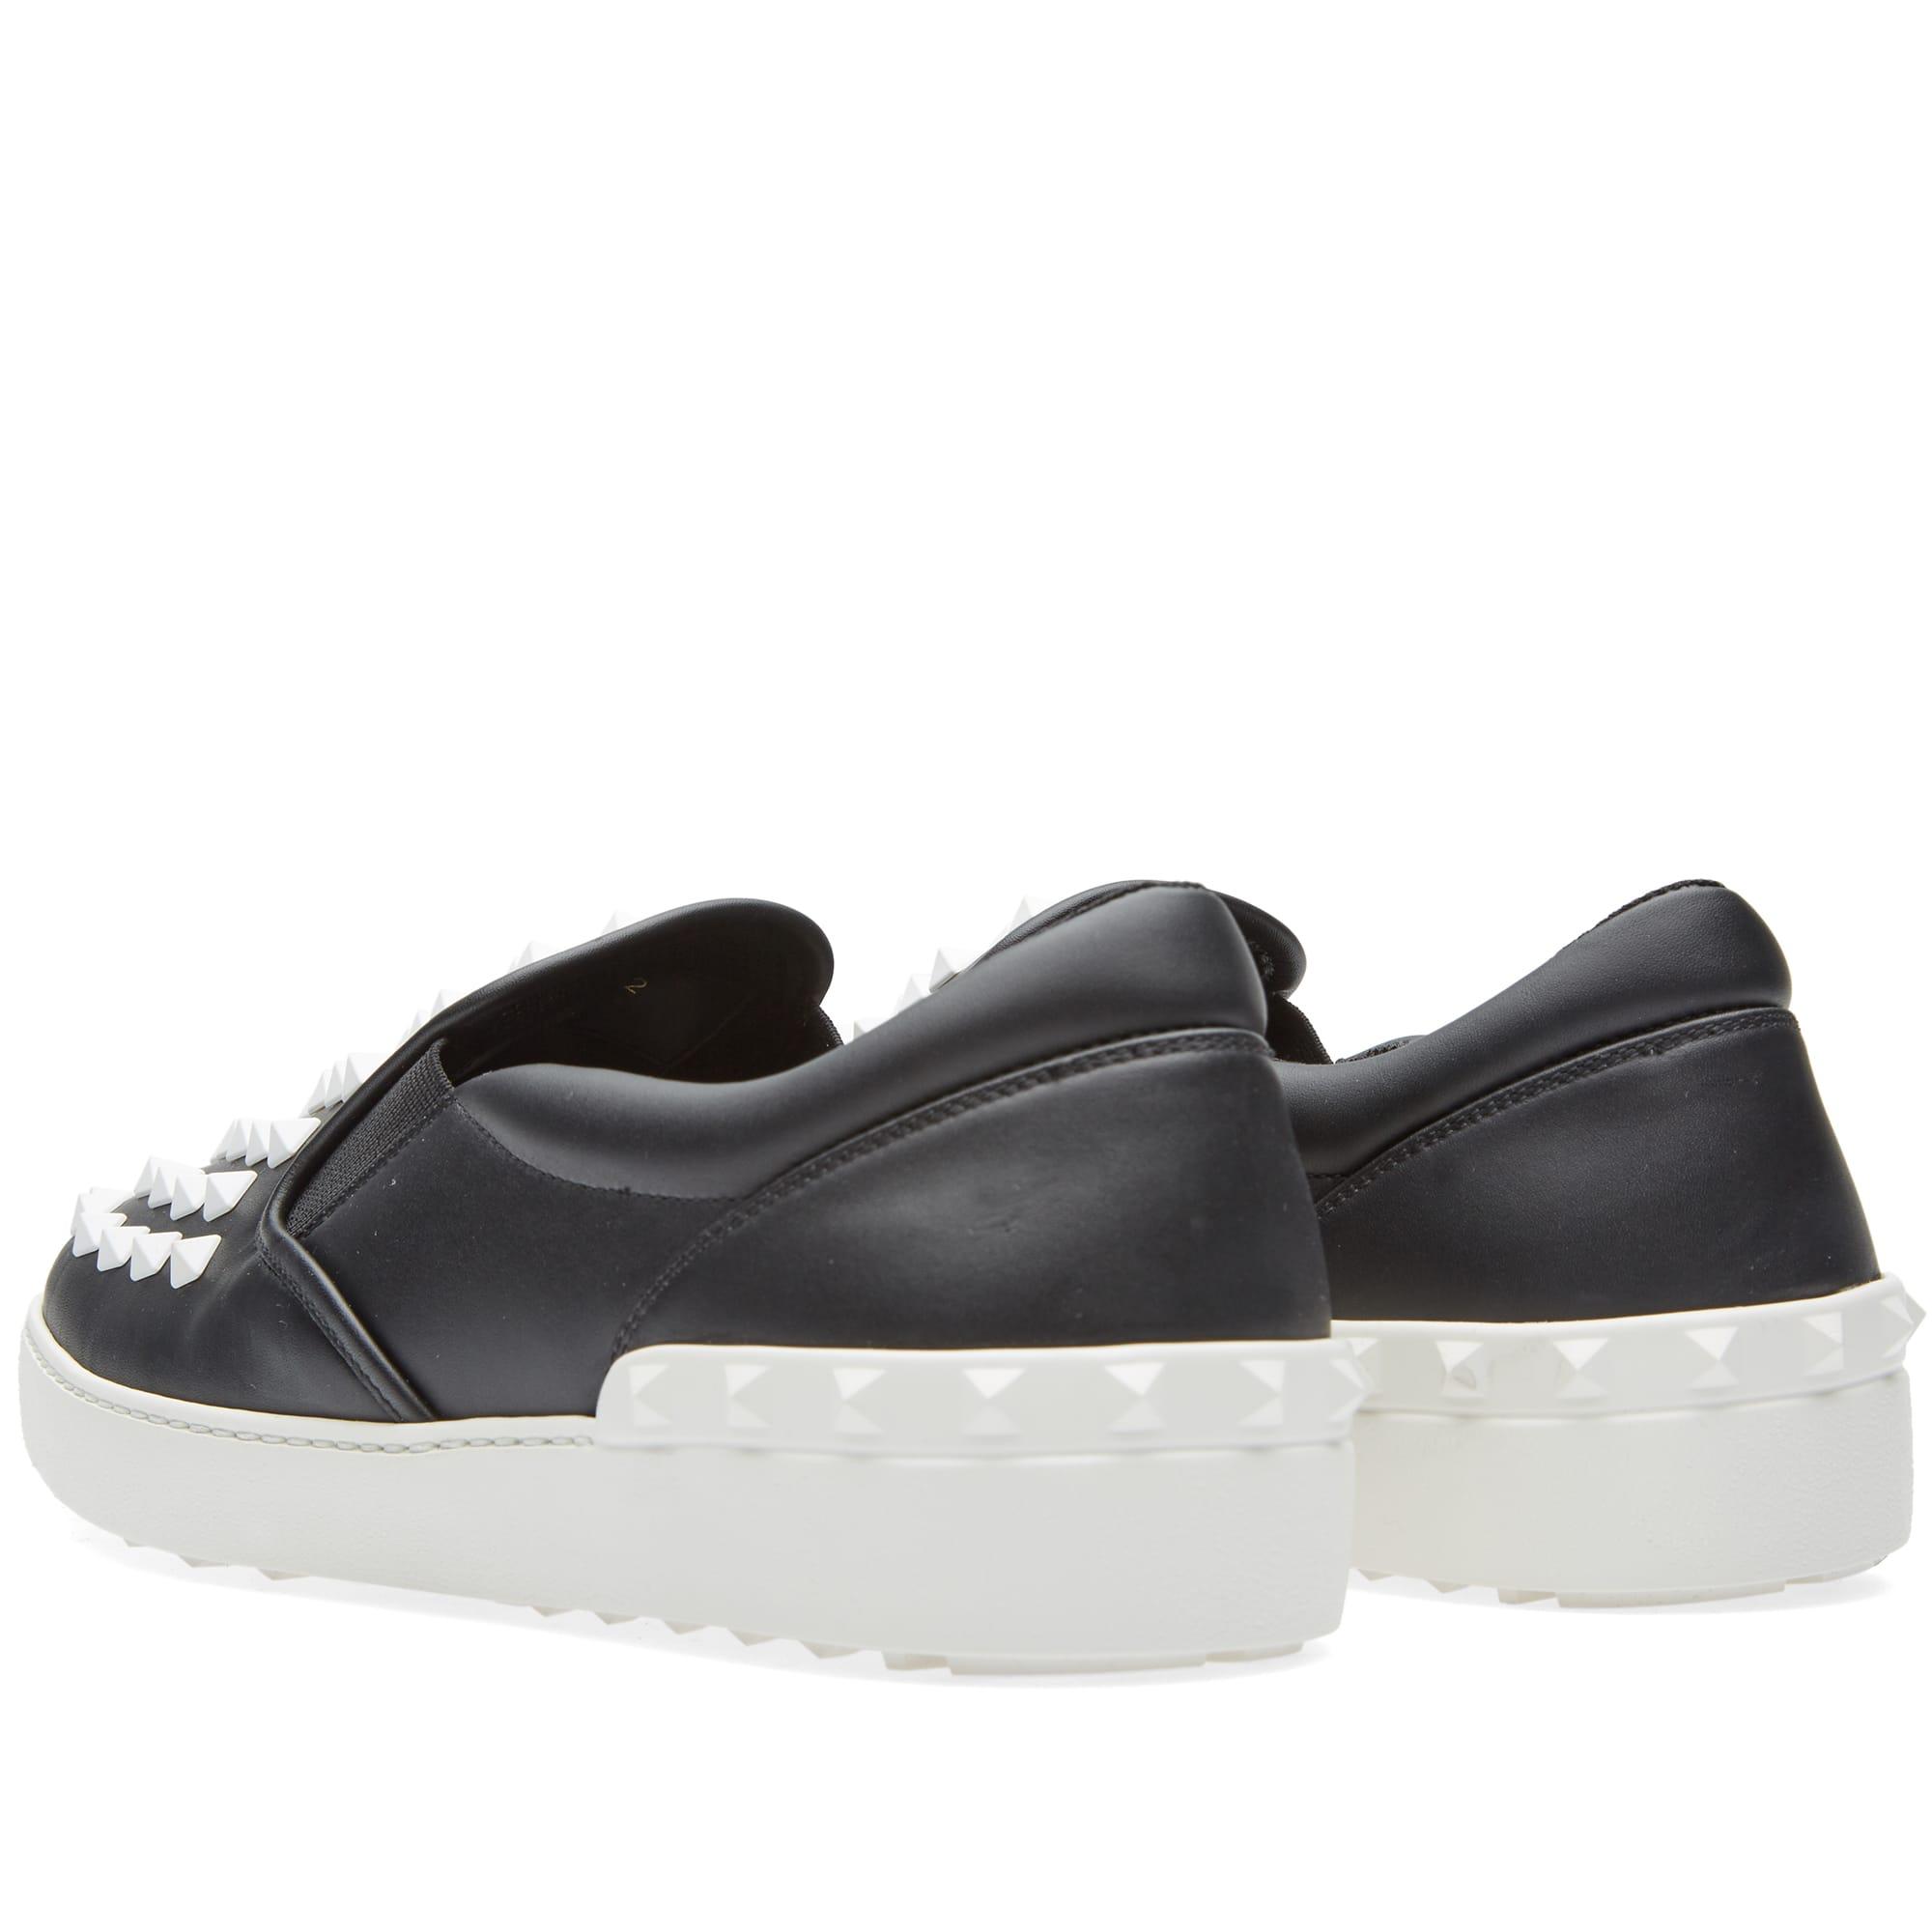 Valentino Slip On Sneaker Black \u0026 White